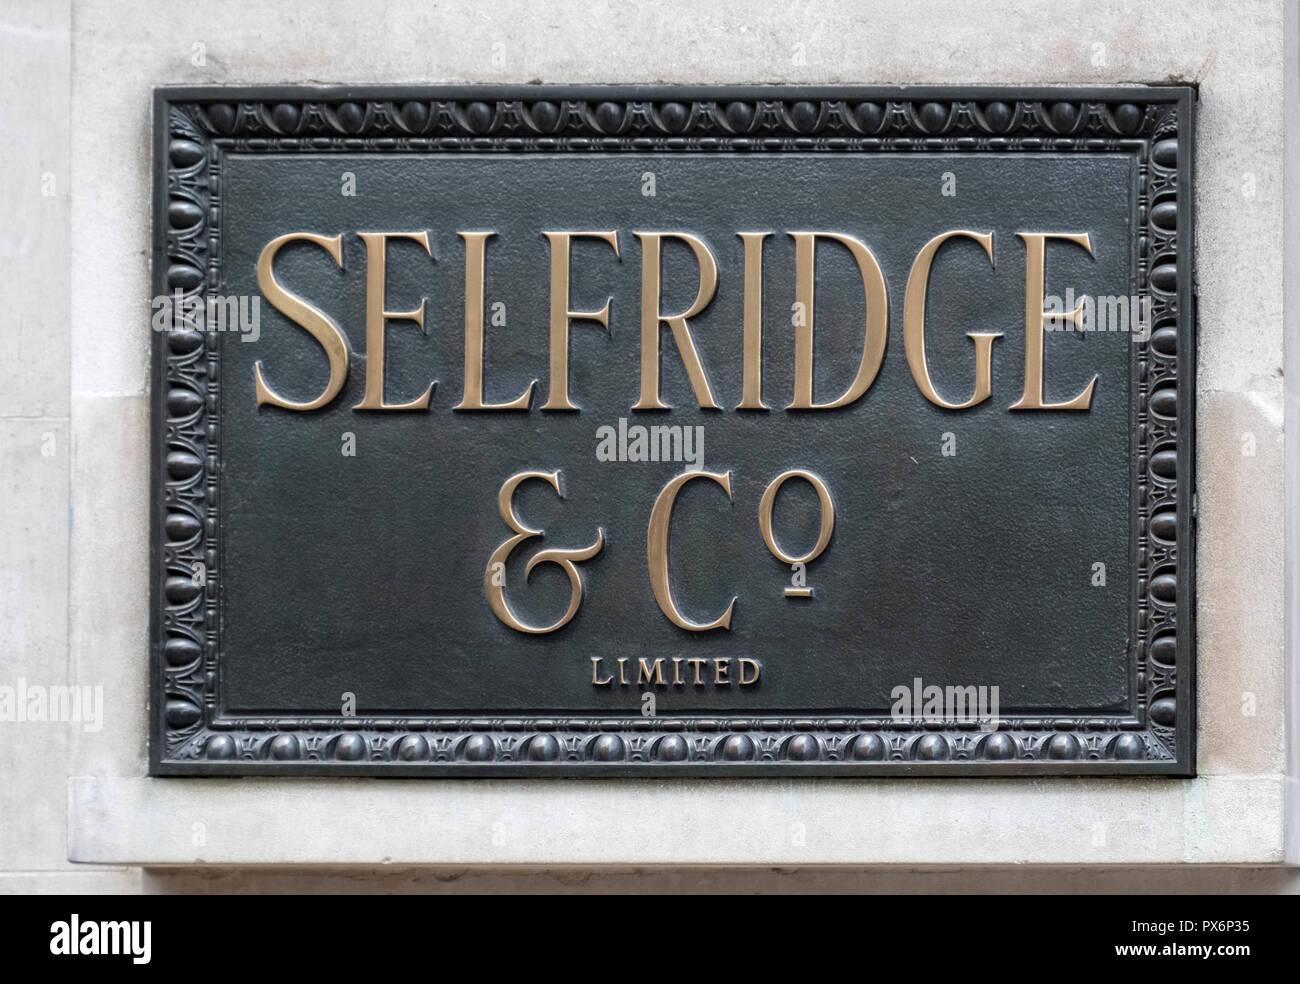 Selfridges Department Store sign, Oxford Street, London, England, UK - Stock Image